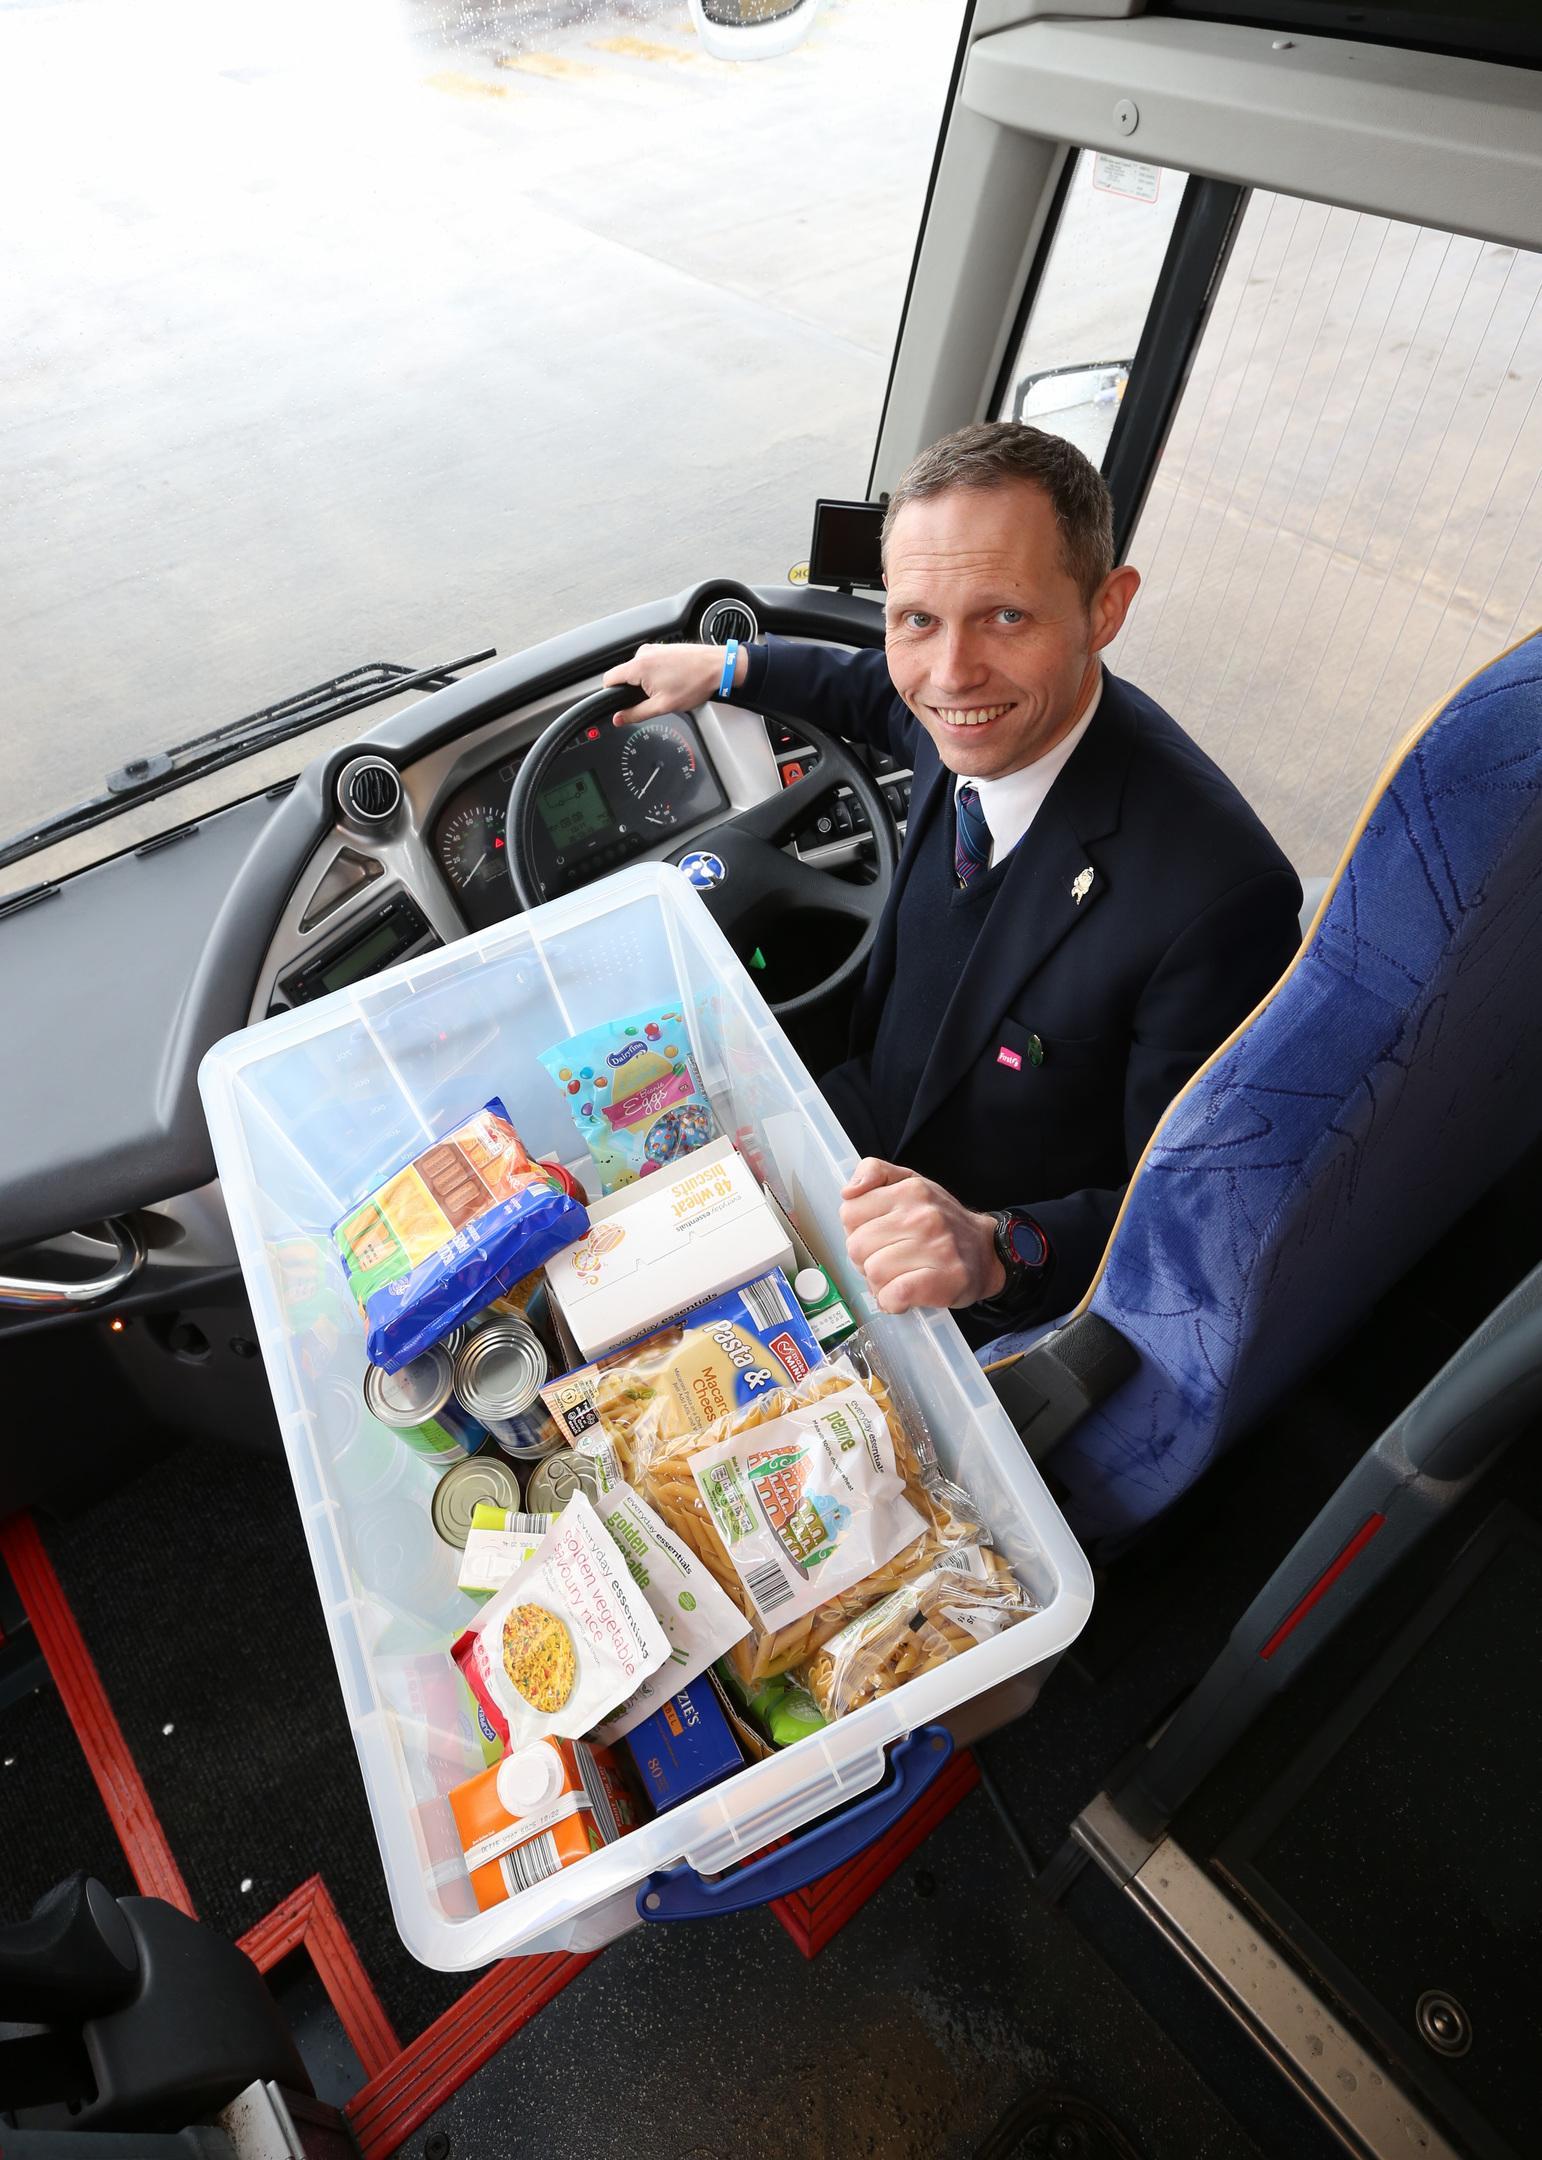 Ian Hay donated the food